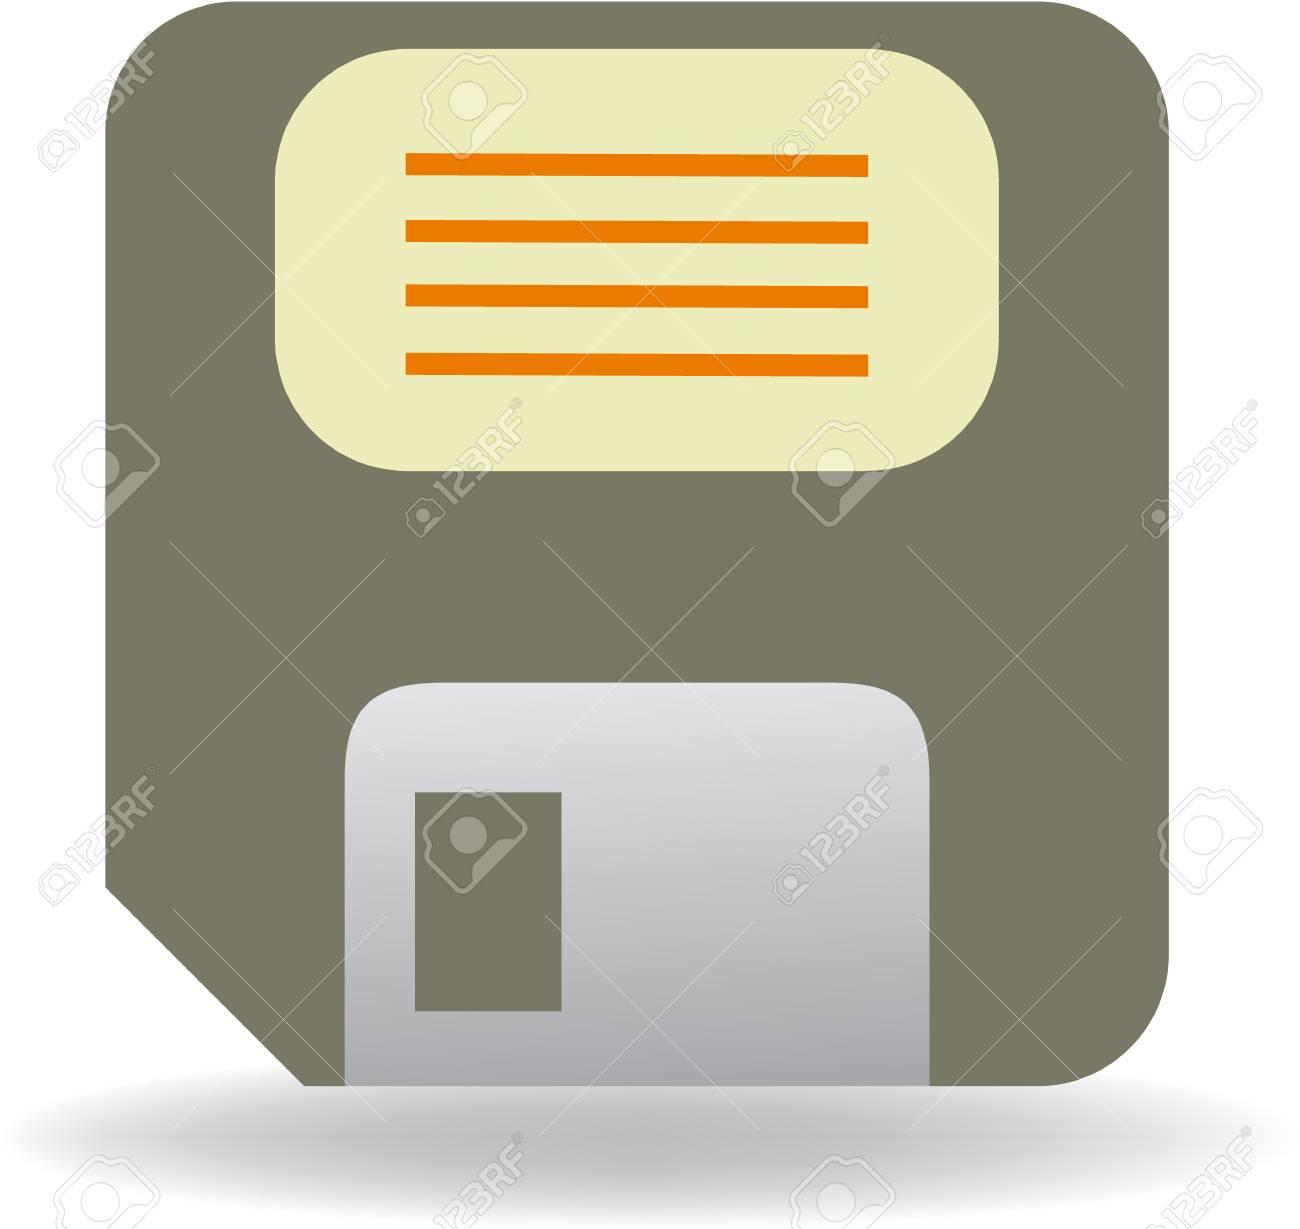 floppy disc vector illustration - 4294670